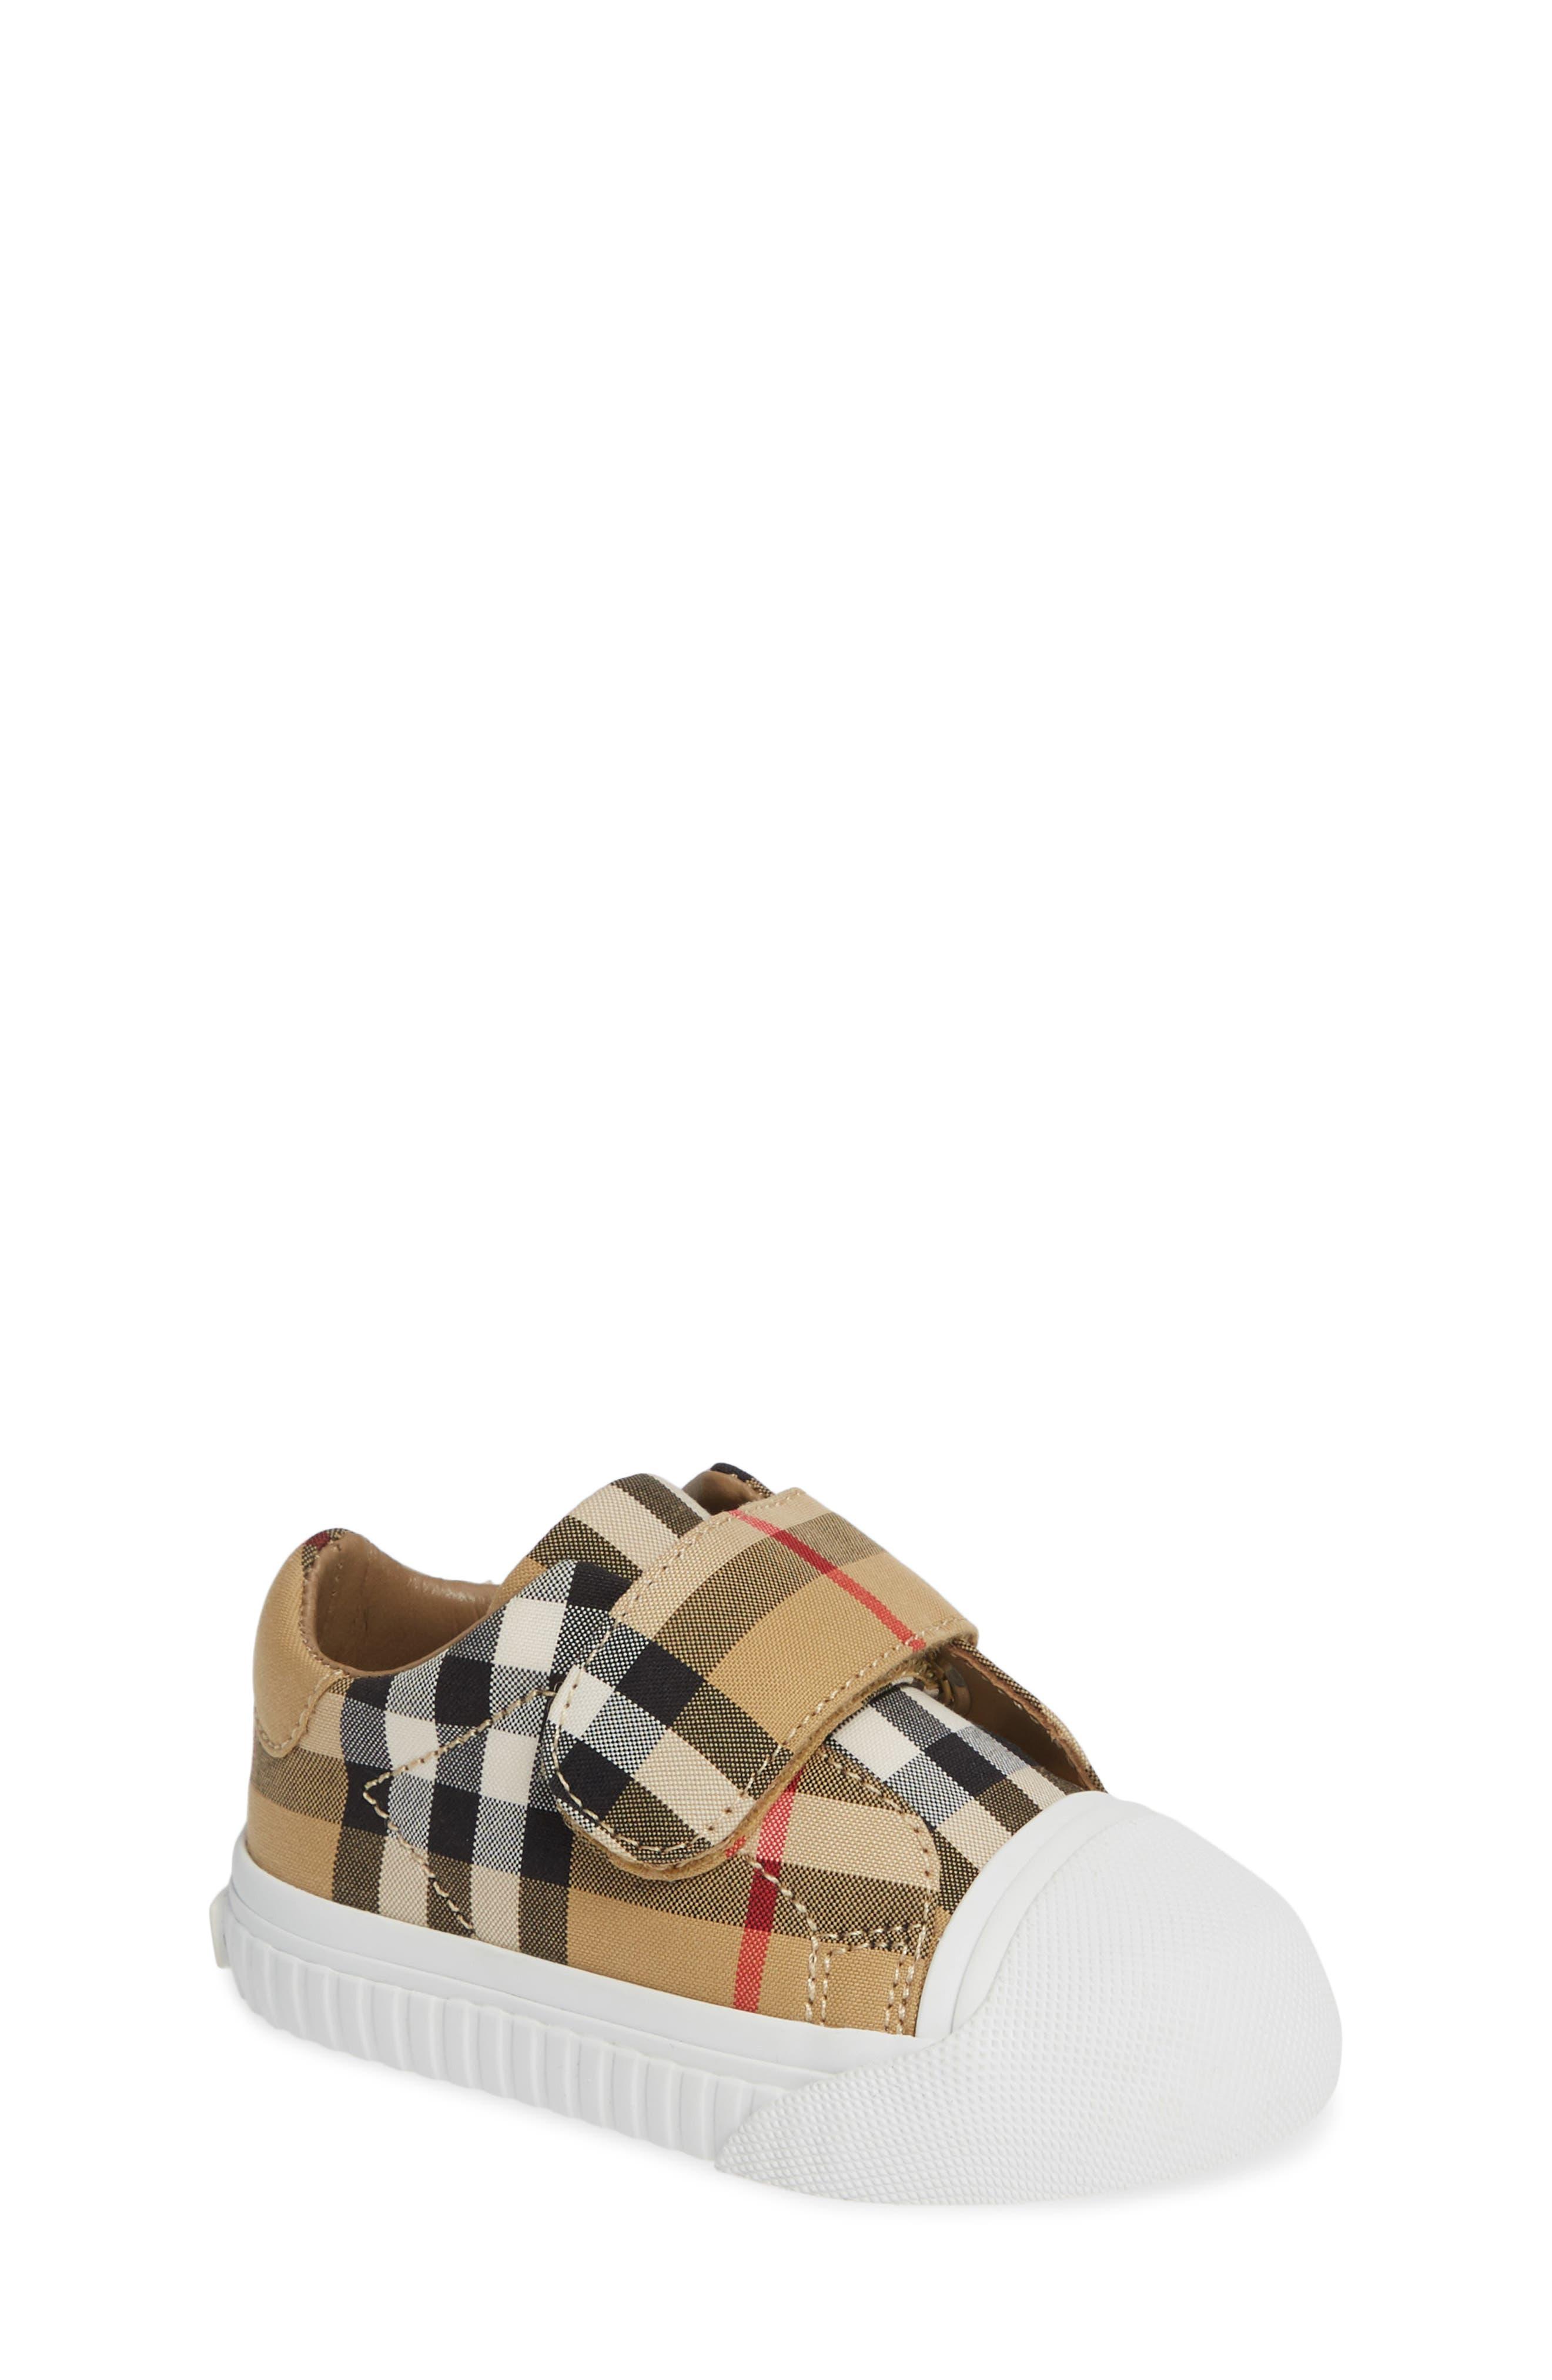 Beech Check Sneaker,                             Main thumbnail 2, color,